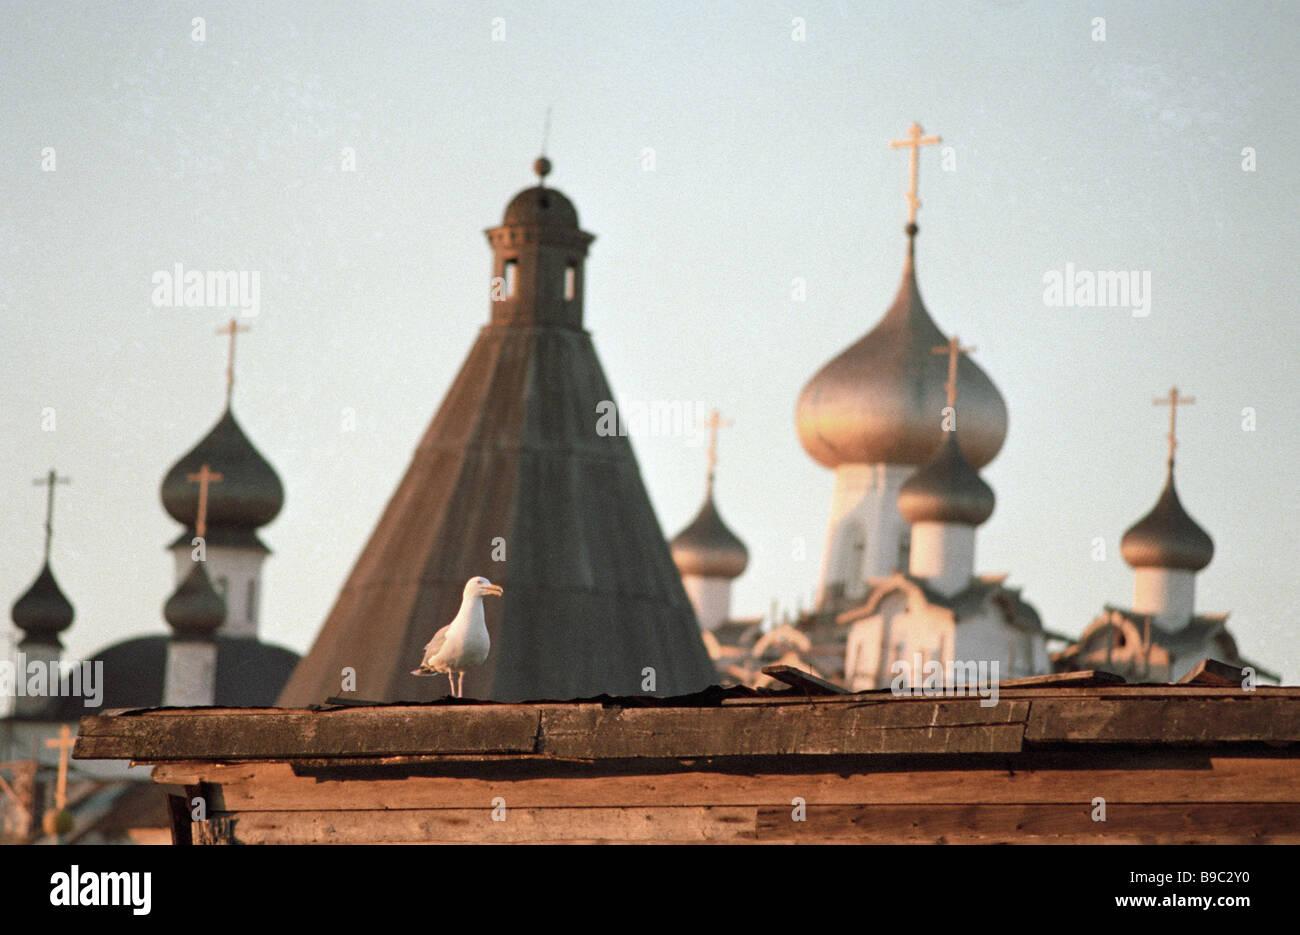 Cupolas of the Solovetsky Kremlin - Stock Image